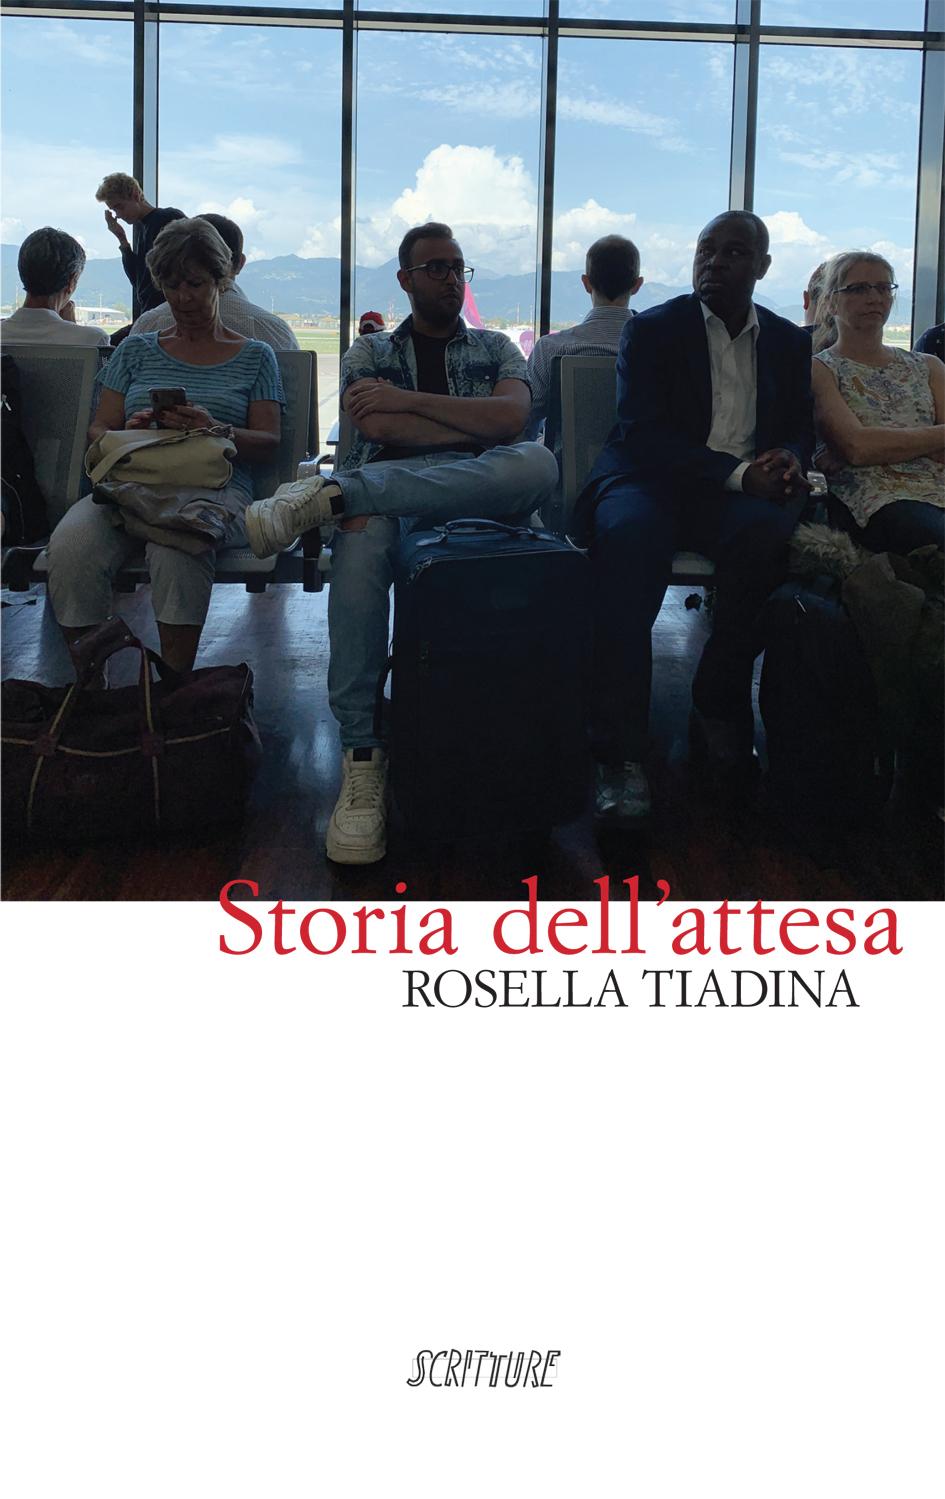 Rosella Tiadina